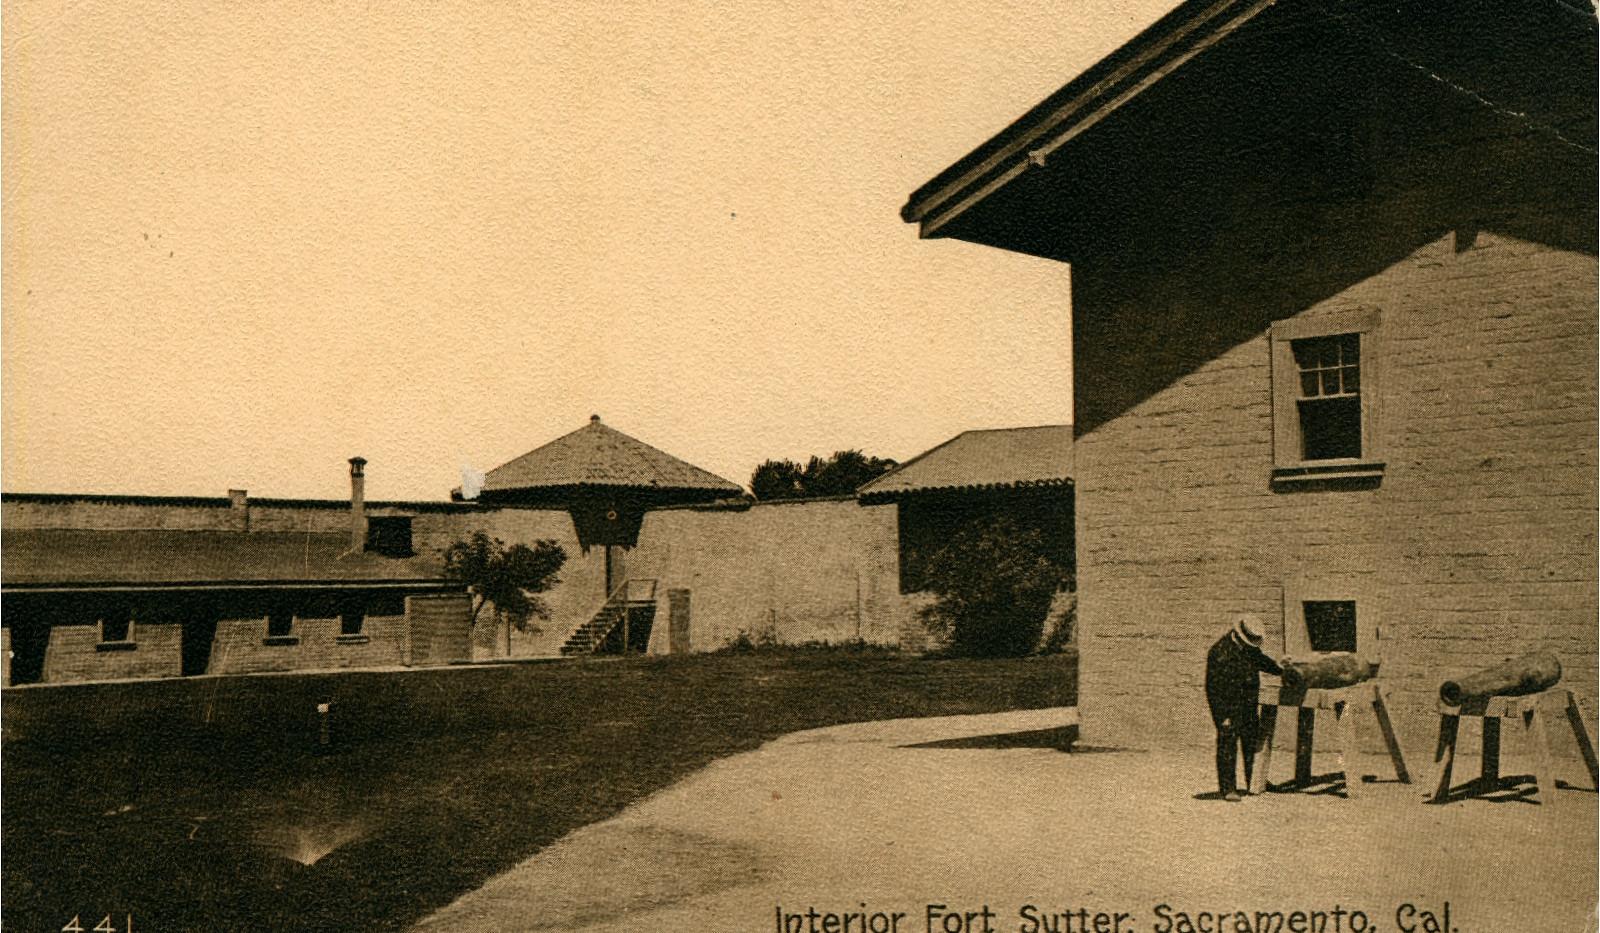 Interior Fort Sutter, Sacramento, California